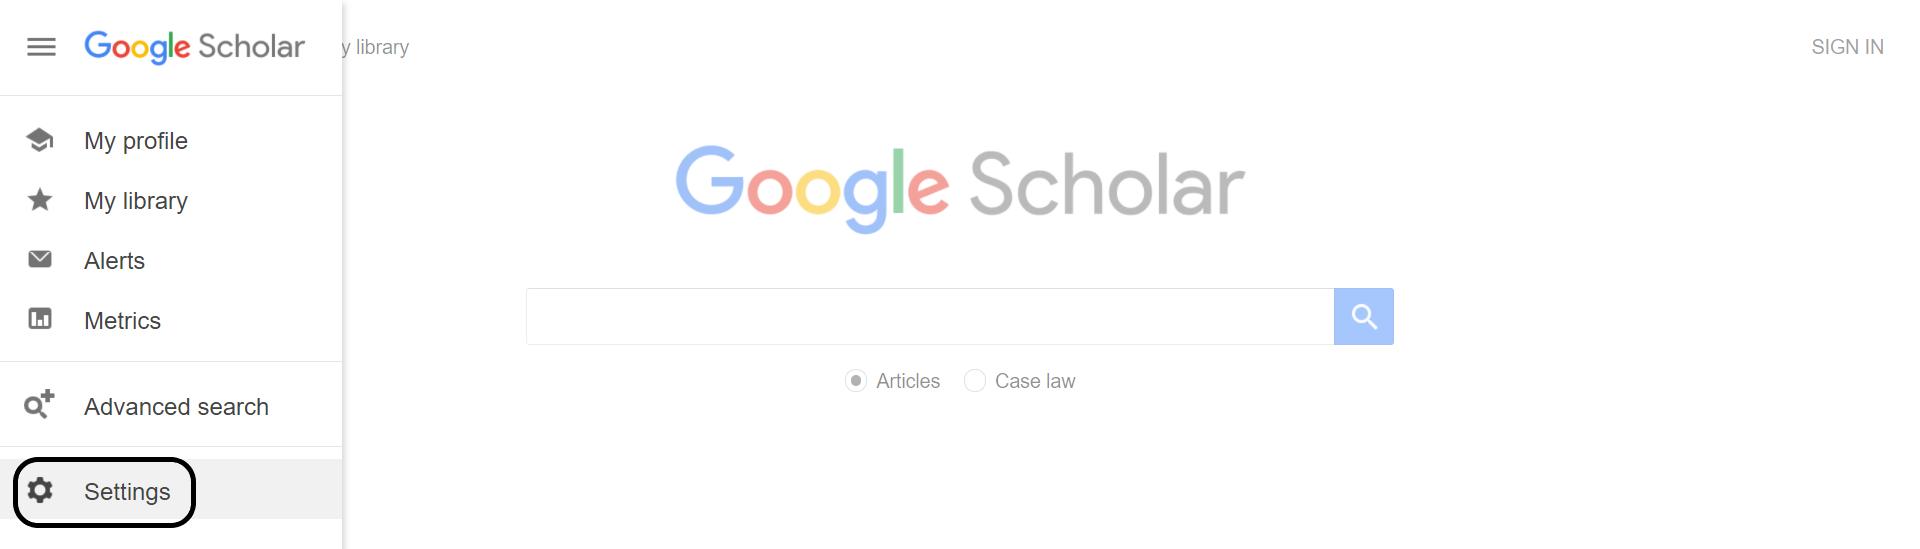 Google Scholar's hamburger menu with the settings optiion highlighted